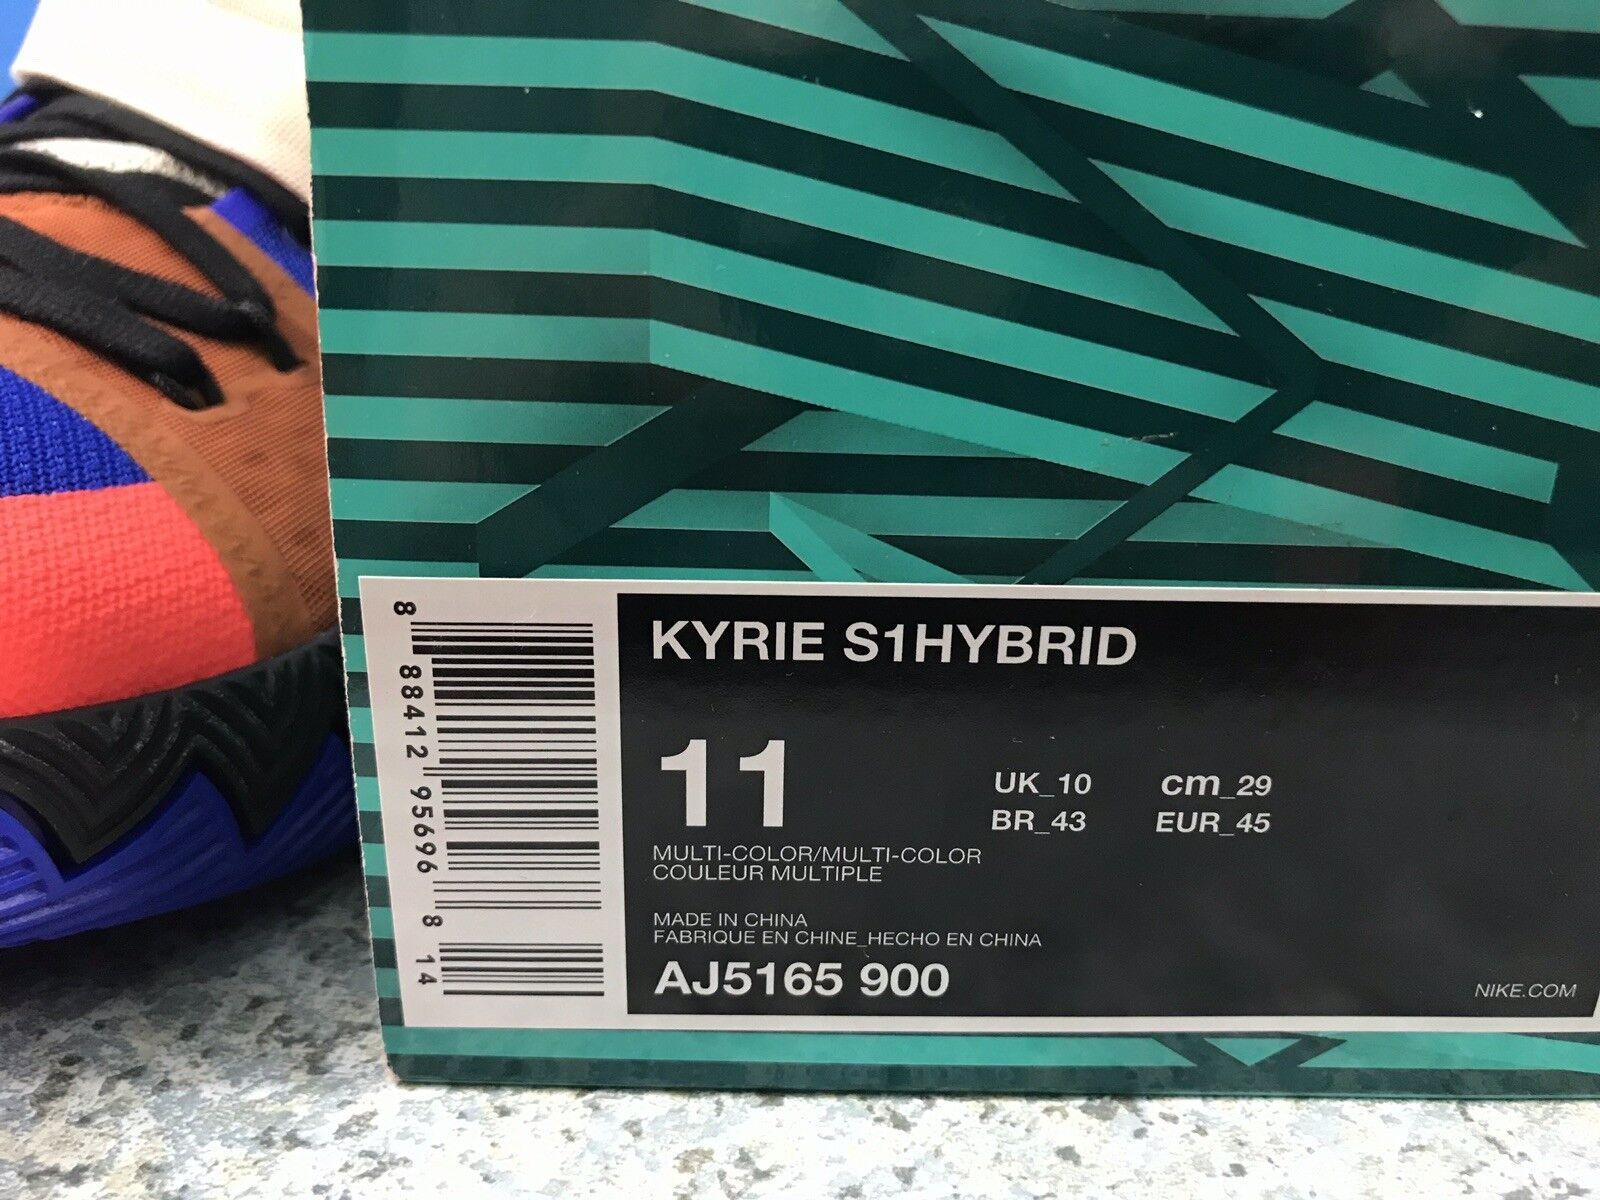 Nike Kyrie S1 What The Hybrid Hybrid Hybrid Sz 11 AJ5165-900 Vivid bluee Multicolor ACG 6b2767